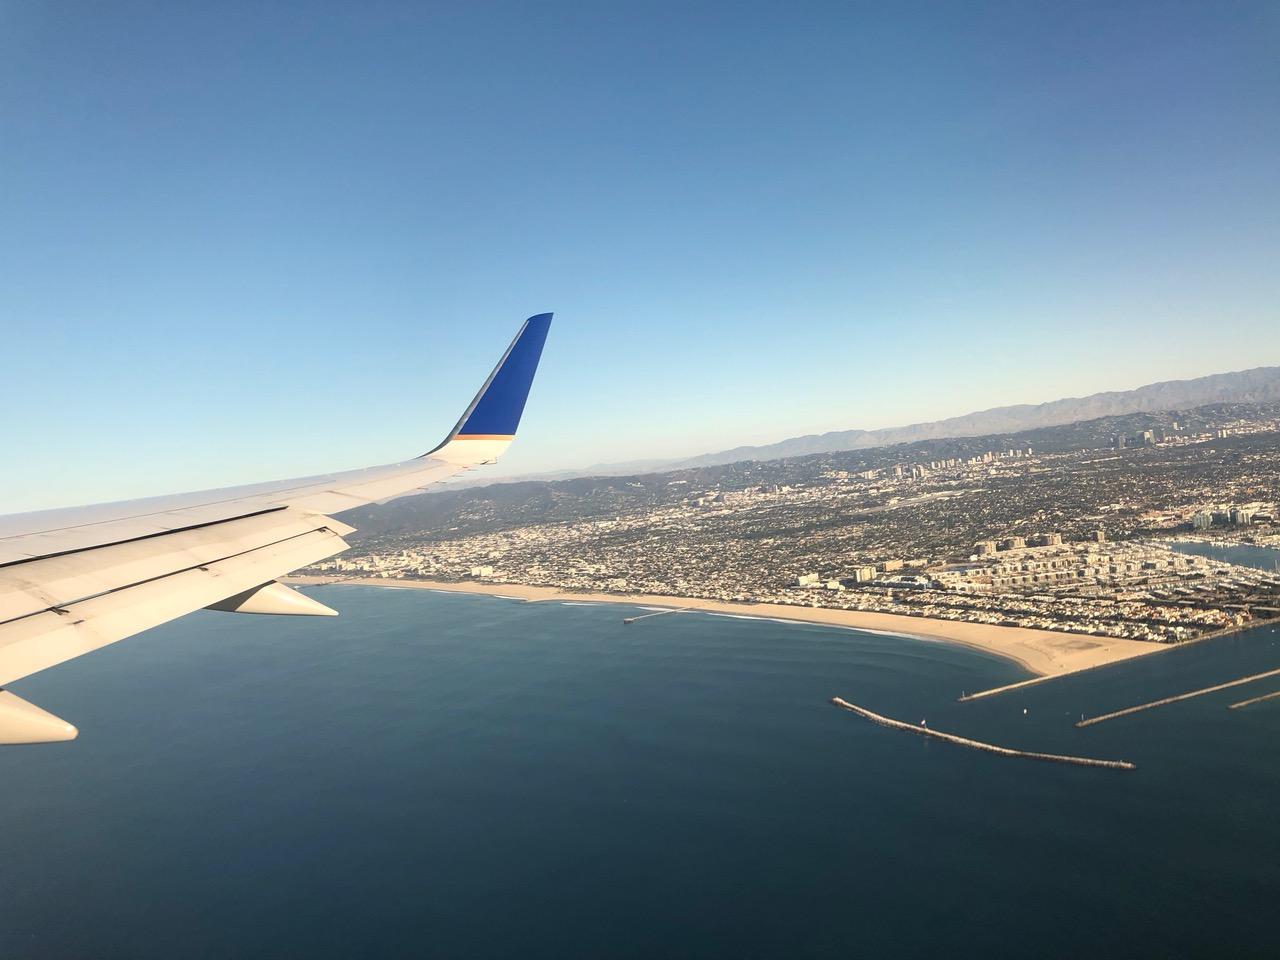 Good bye Los Angeles....we won't miss you!